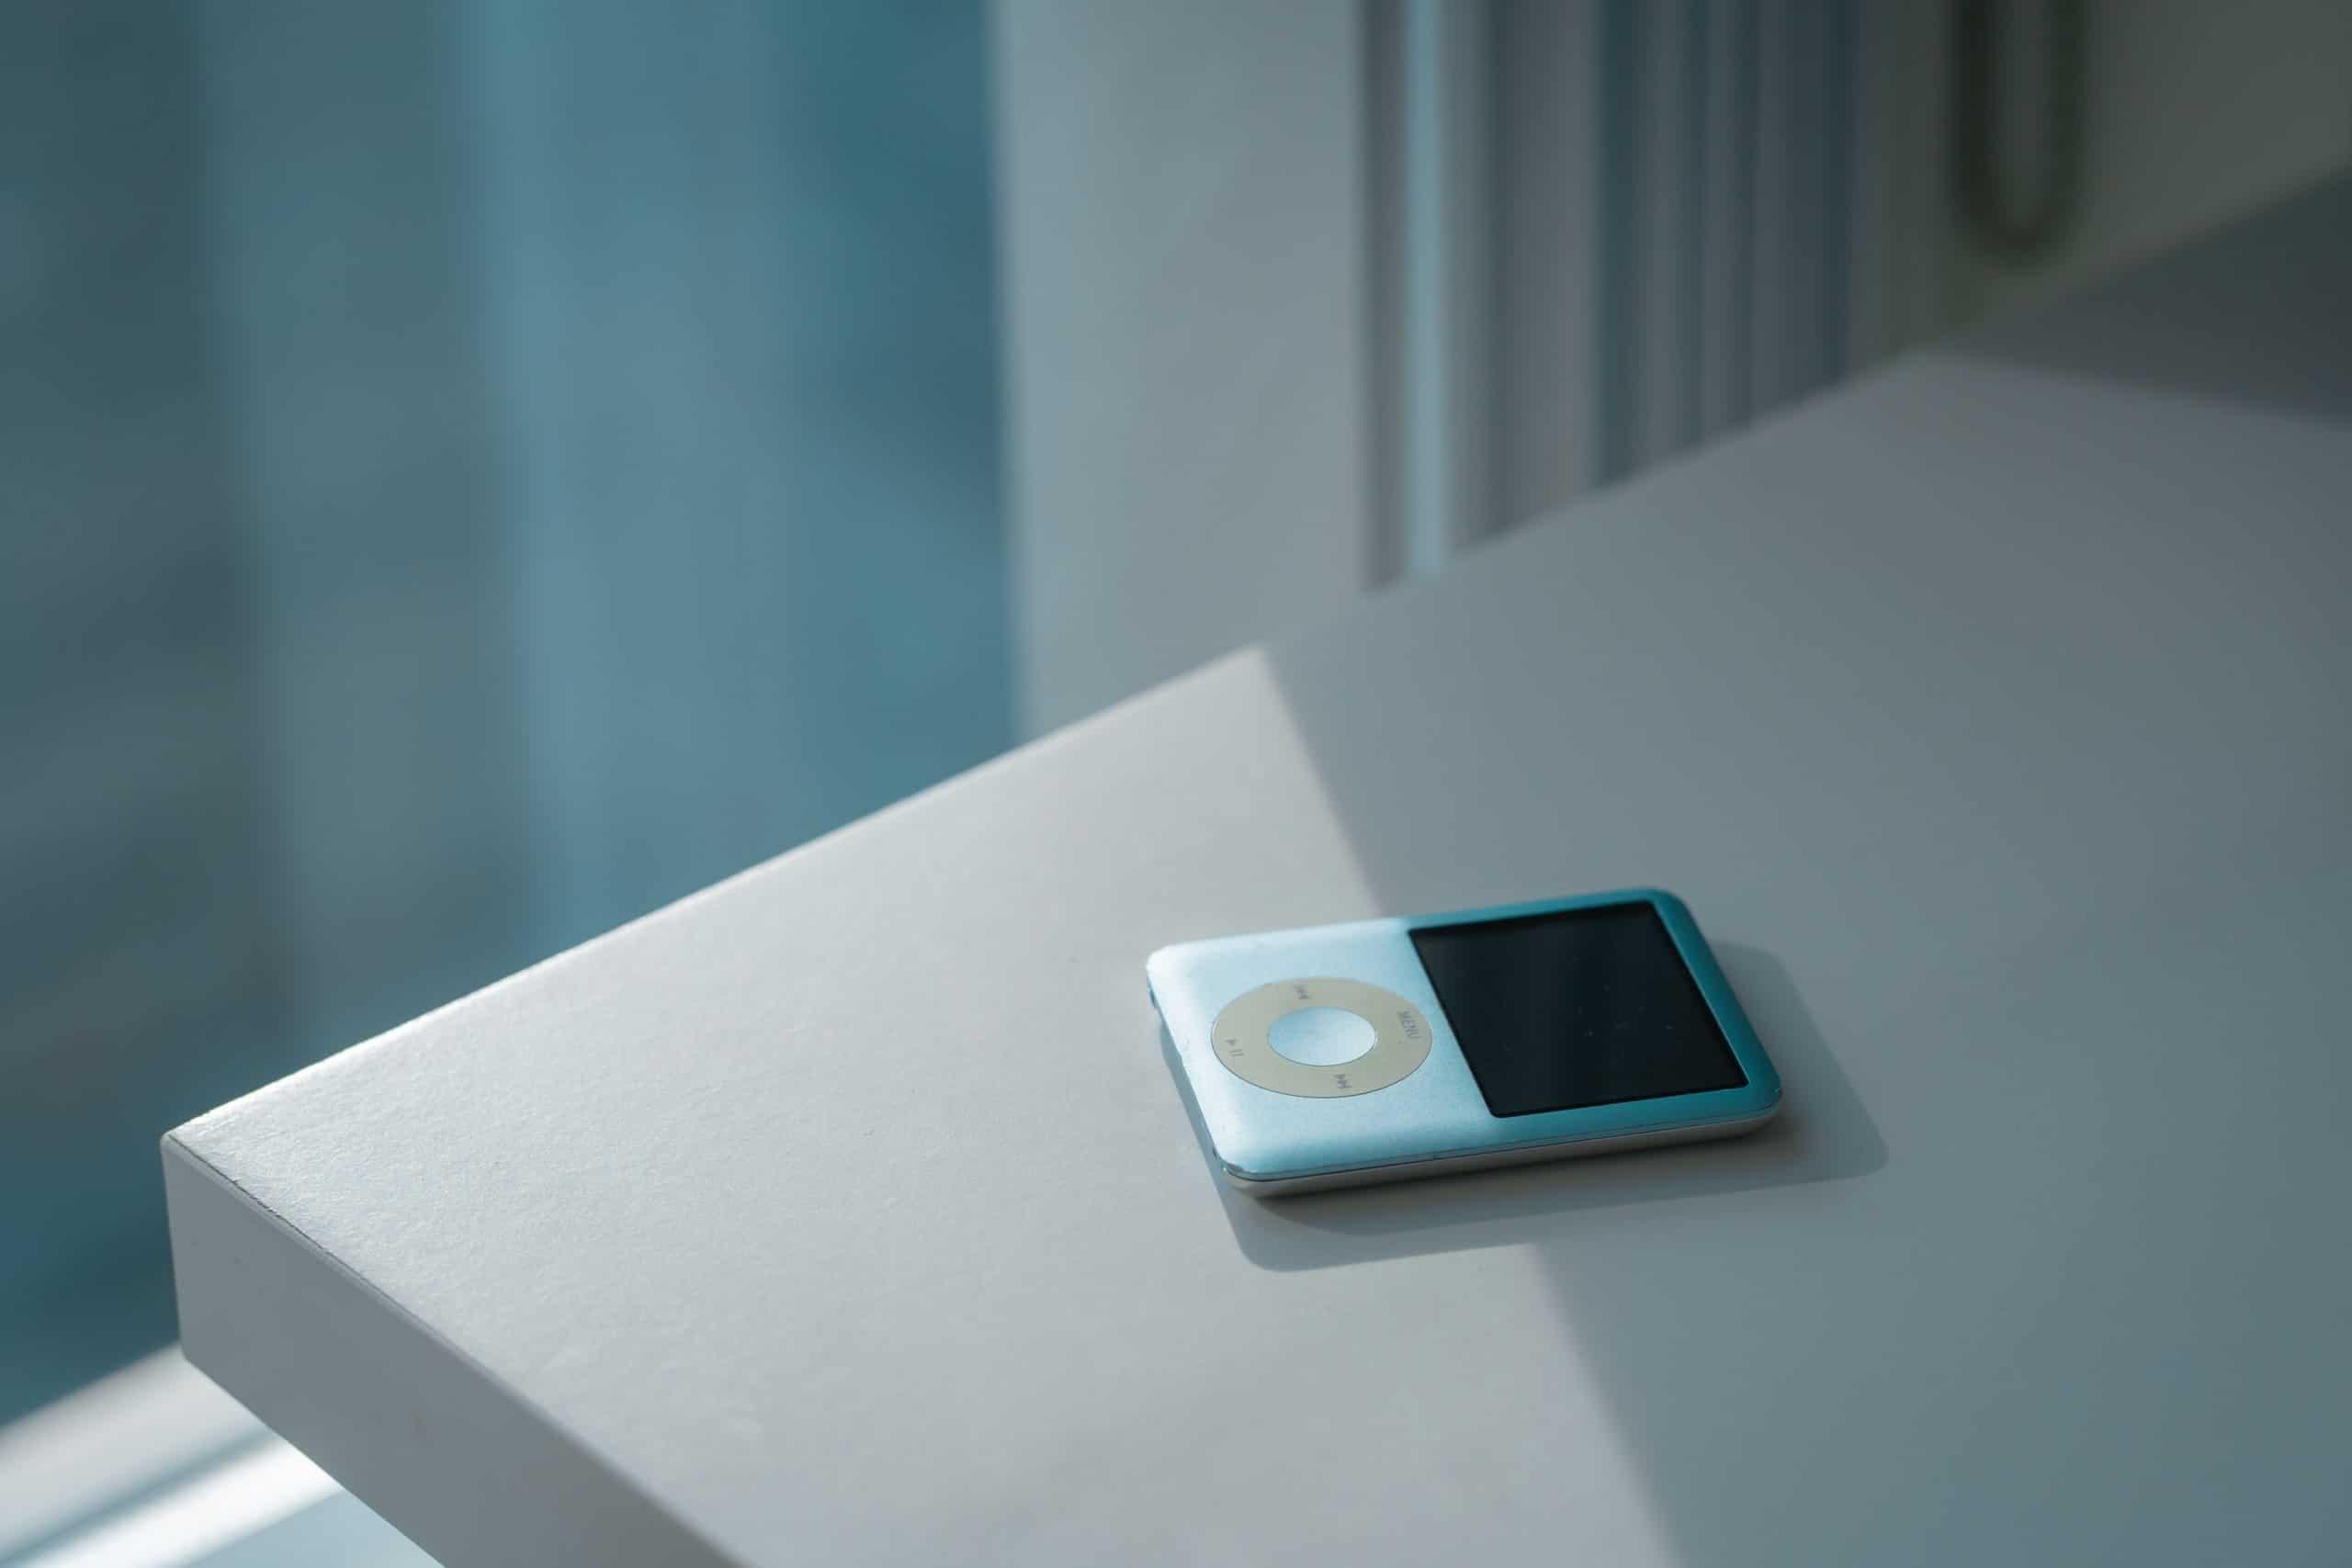 Do iPods really shuffle?